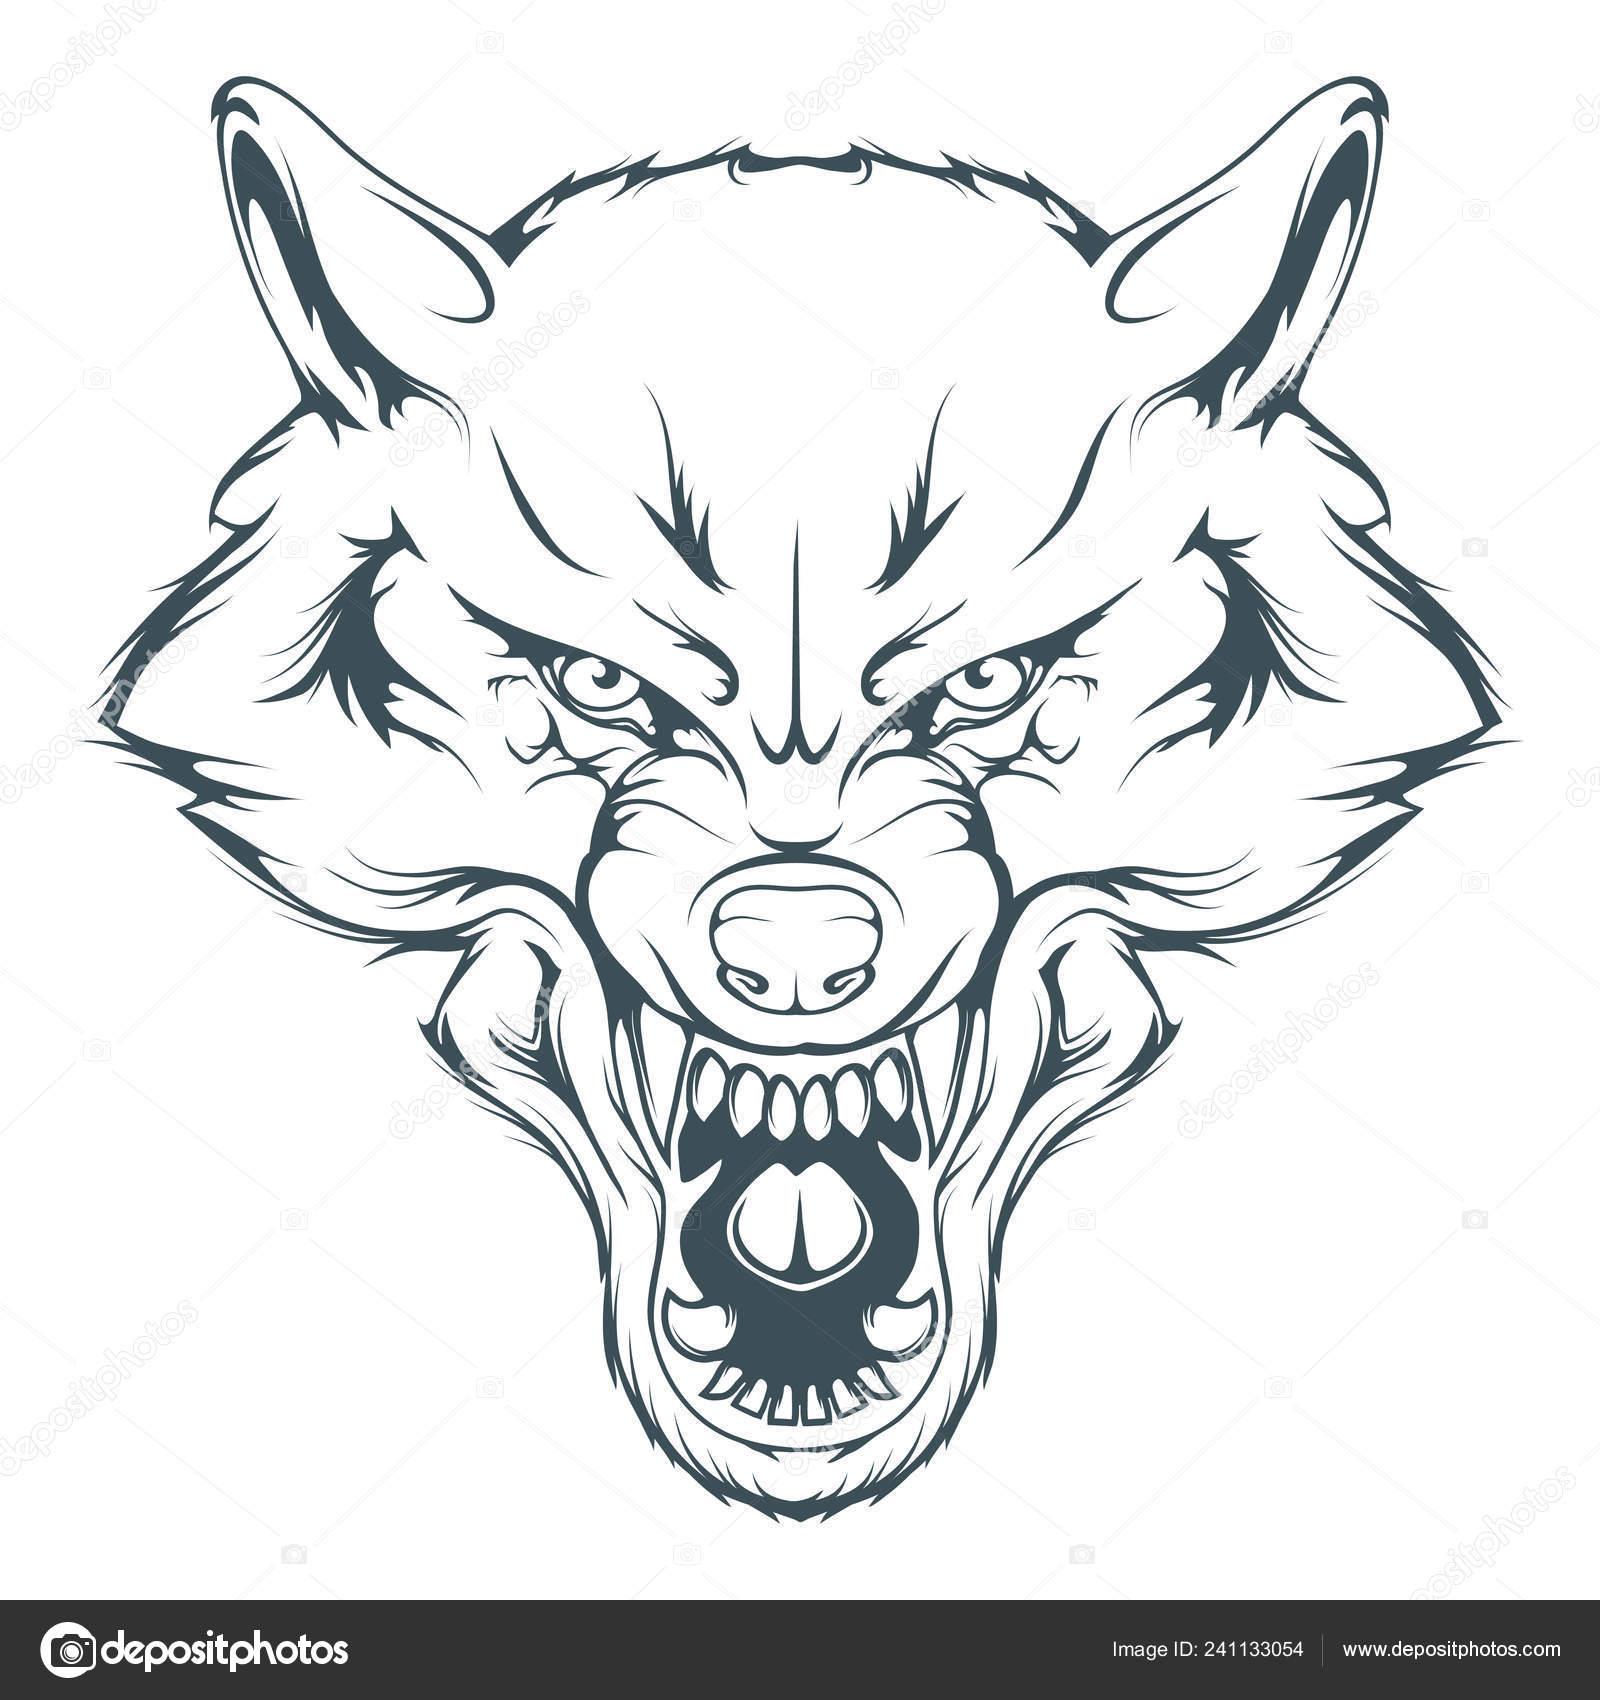 Vlci Hlava Vektorove Kresleni Nacrtu Vykresu Tvar Vlk Vlci Hlava